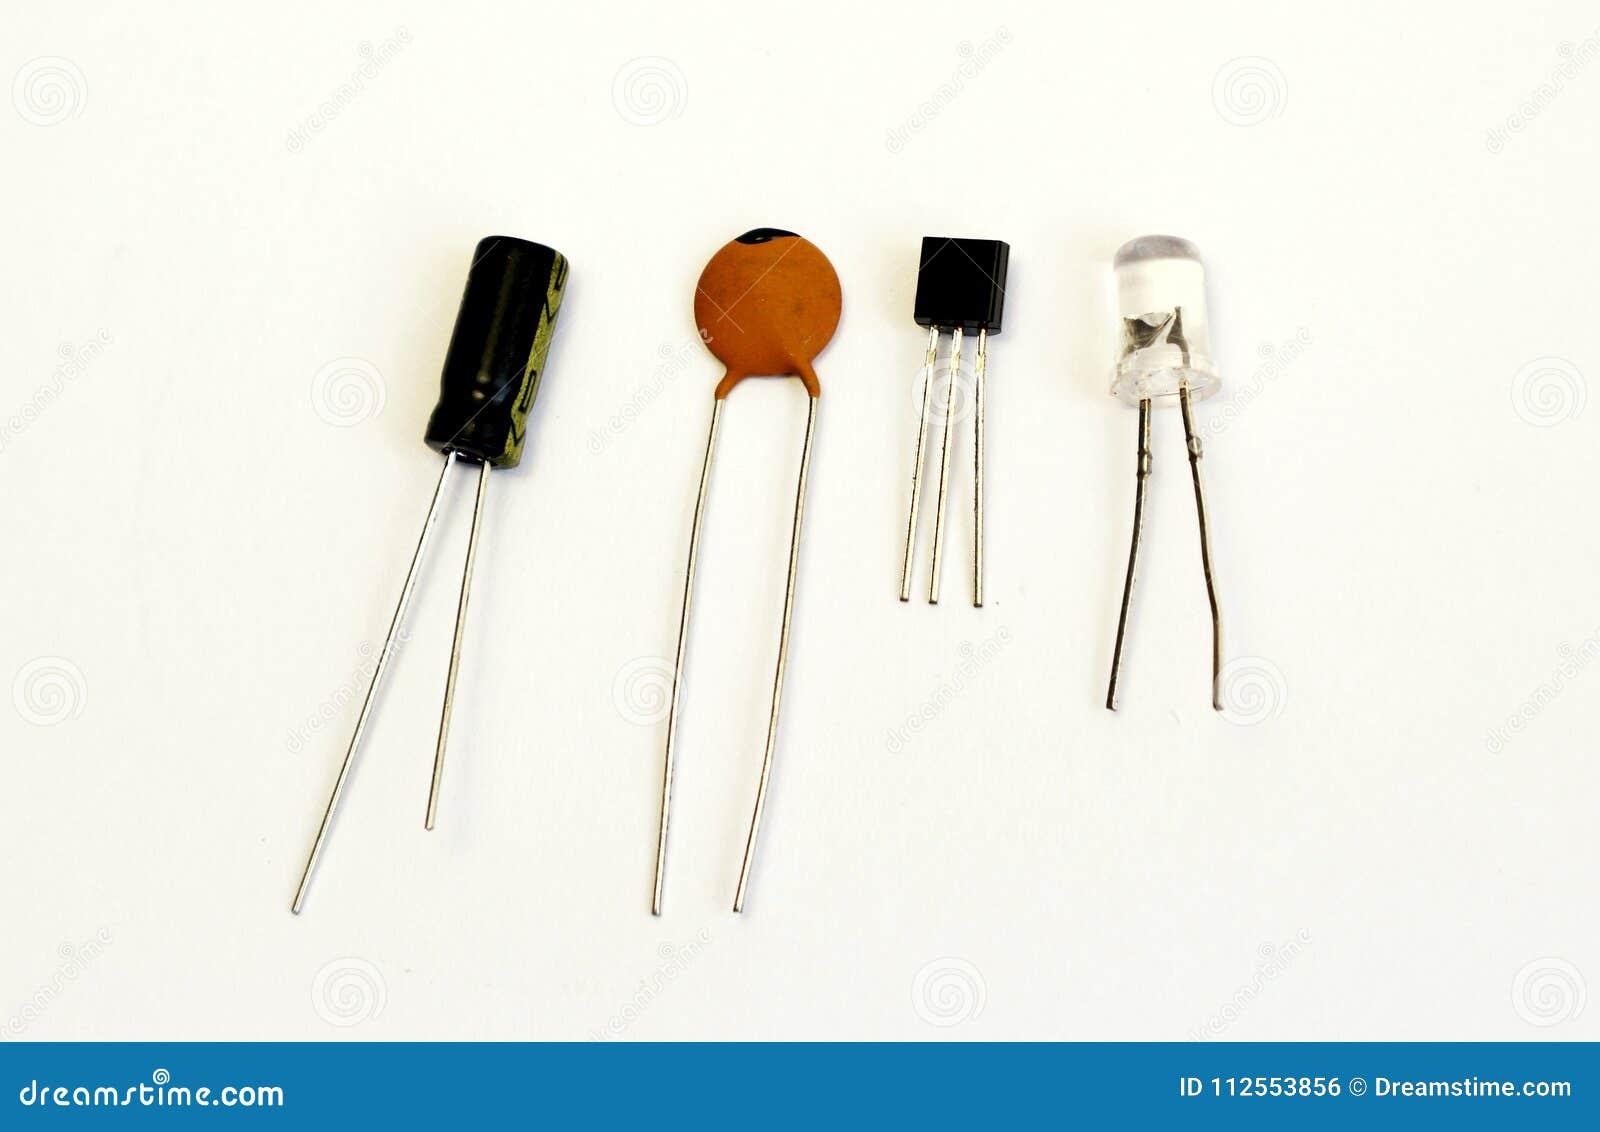 Led Transistor Capacitor Radio Component Stock Photo Image Of Circuit